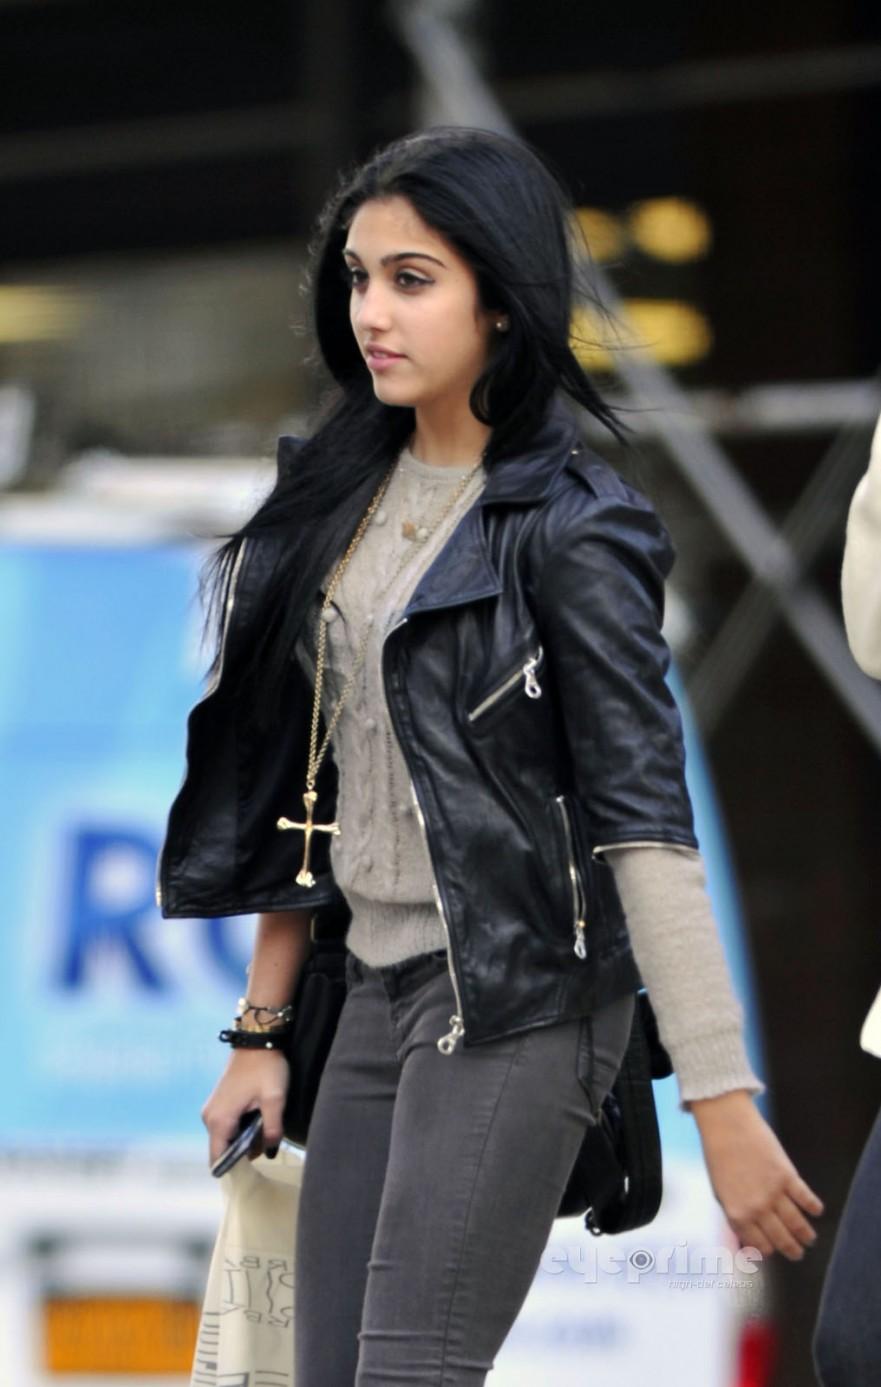 New York Prime >> Hardcandylola: lola Leon seen out shopping in New York, Oct 17